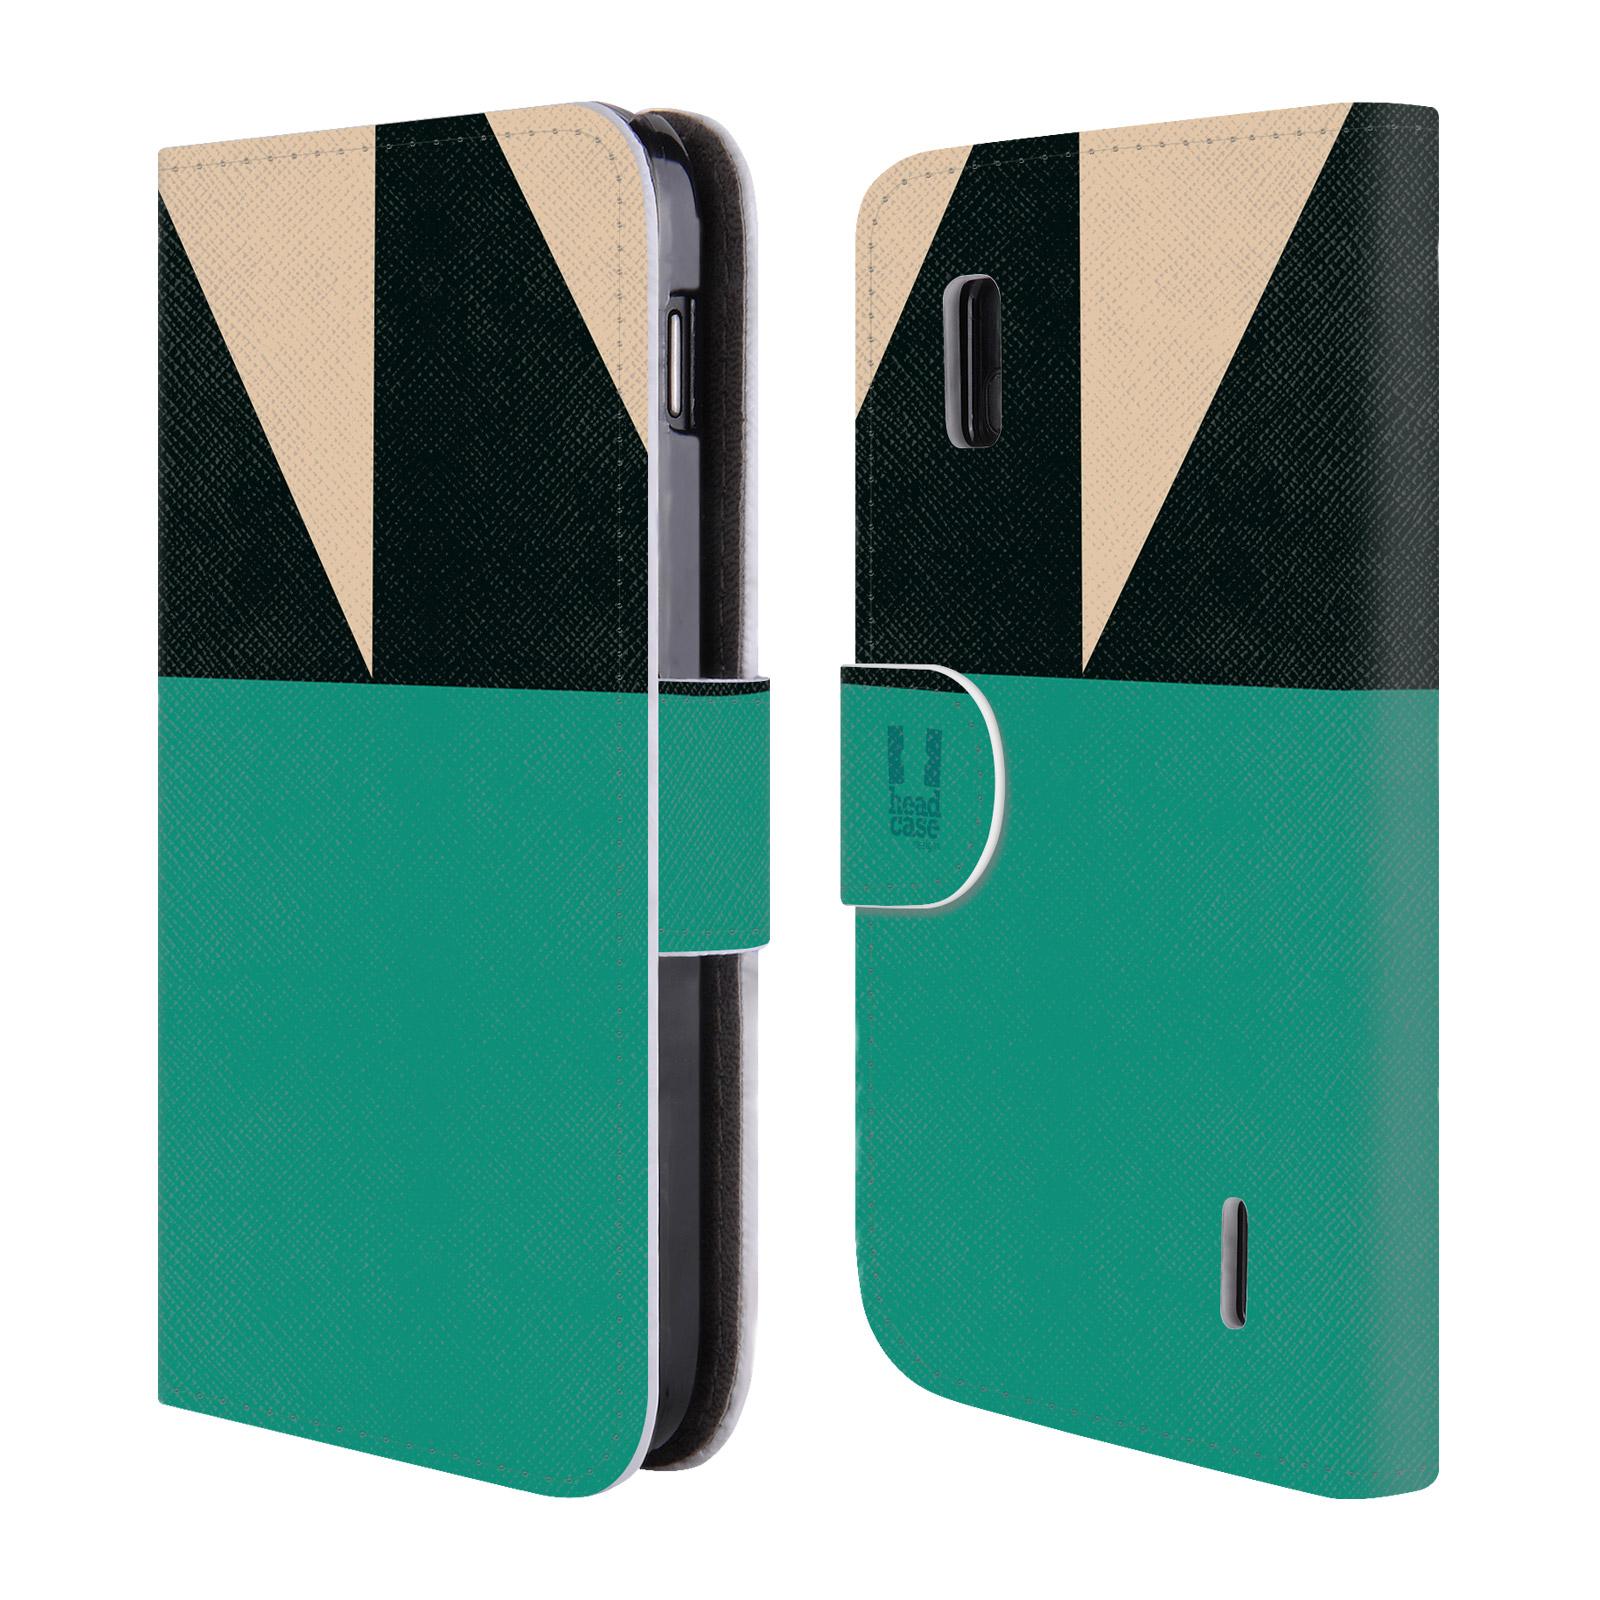 HEAD CASE Flipové pouzdro pro mobil LG NEXUS 4 barevné tvary moře modrá